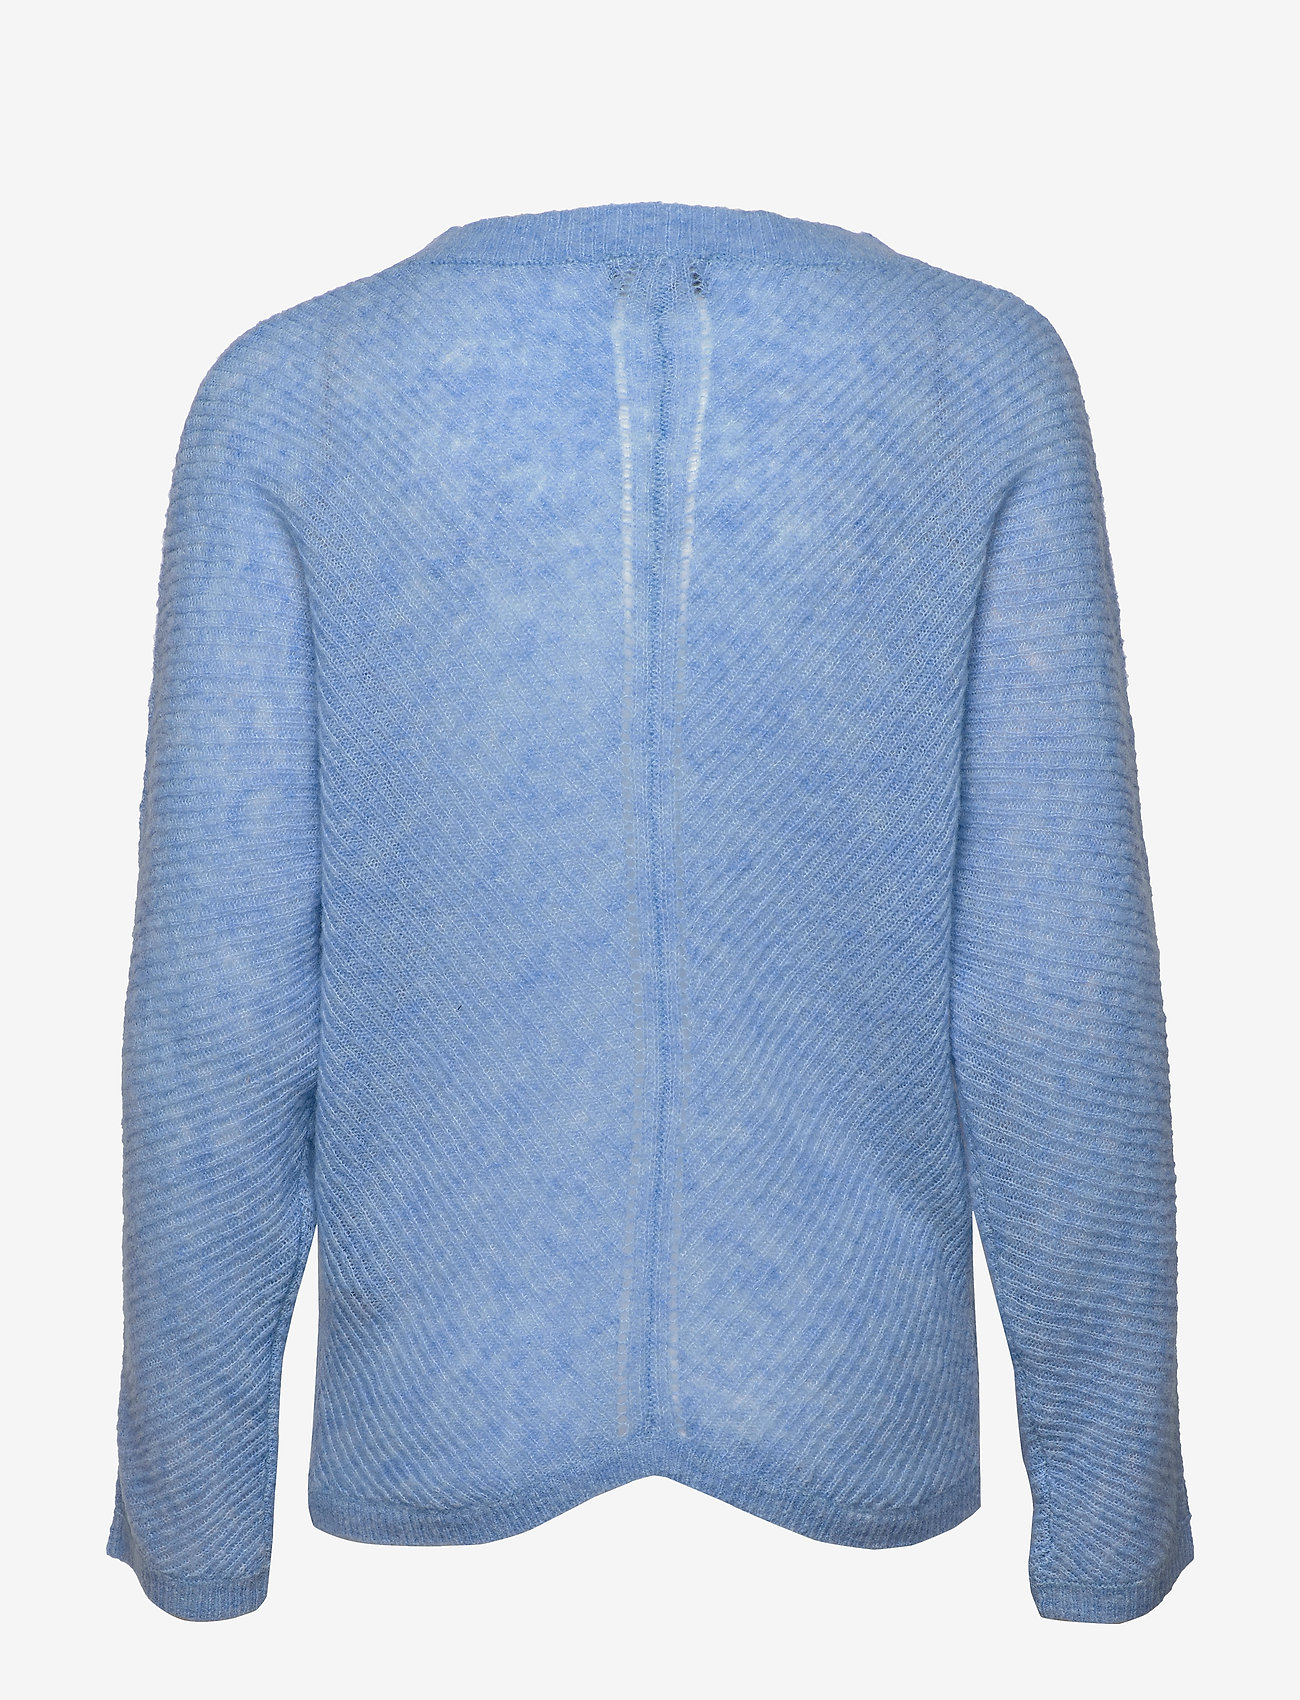 SAND - 5194 - Silje Cardigan - cardigans - light blue - 1